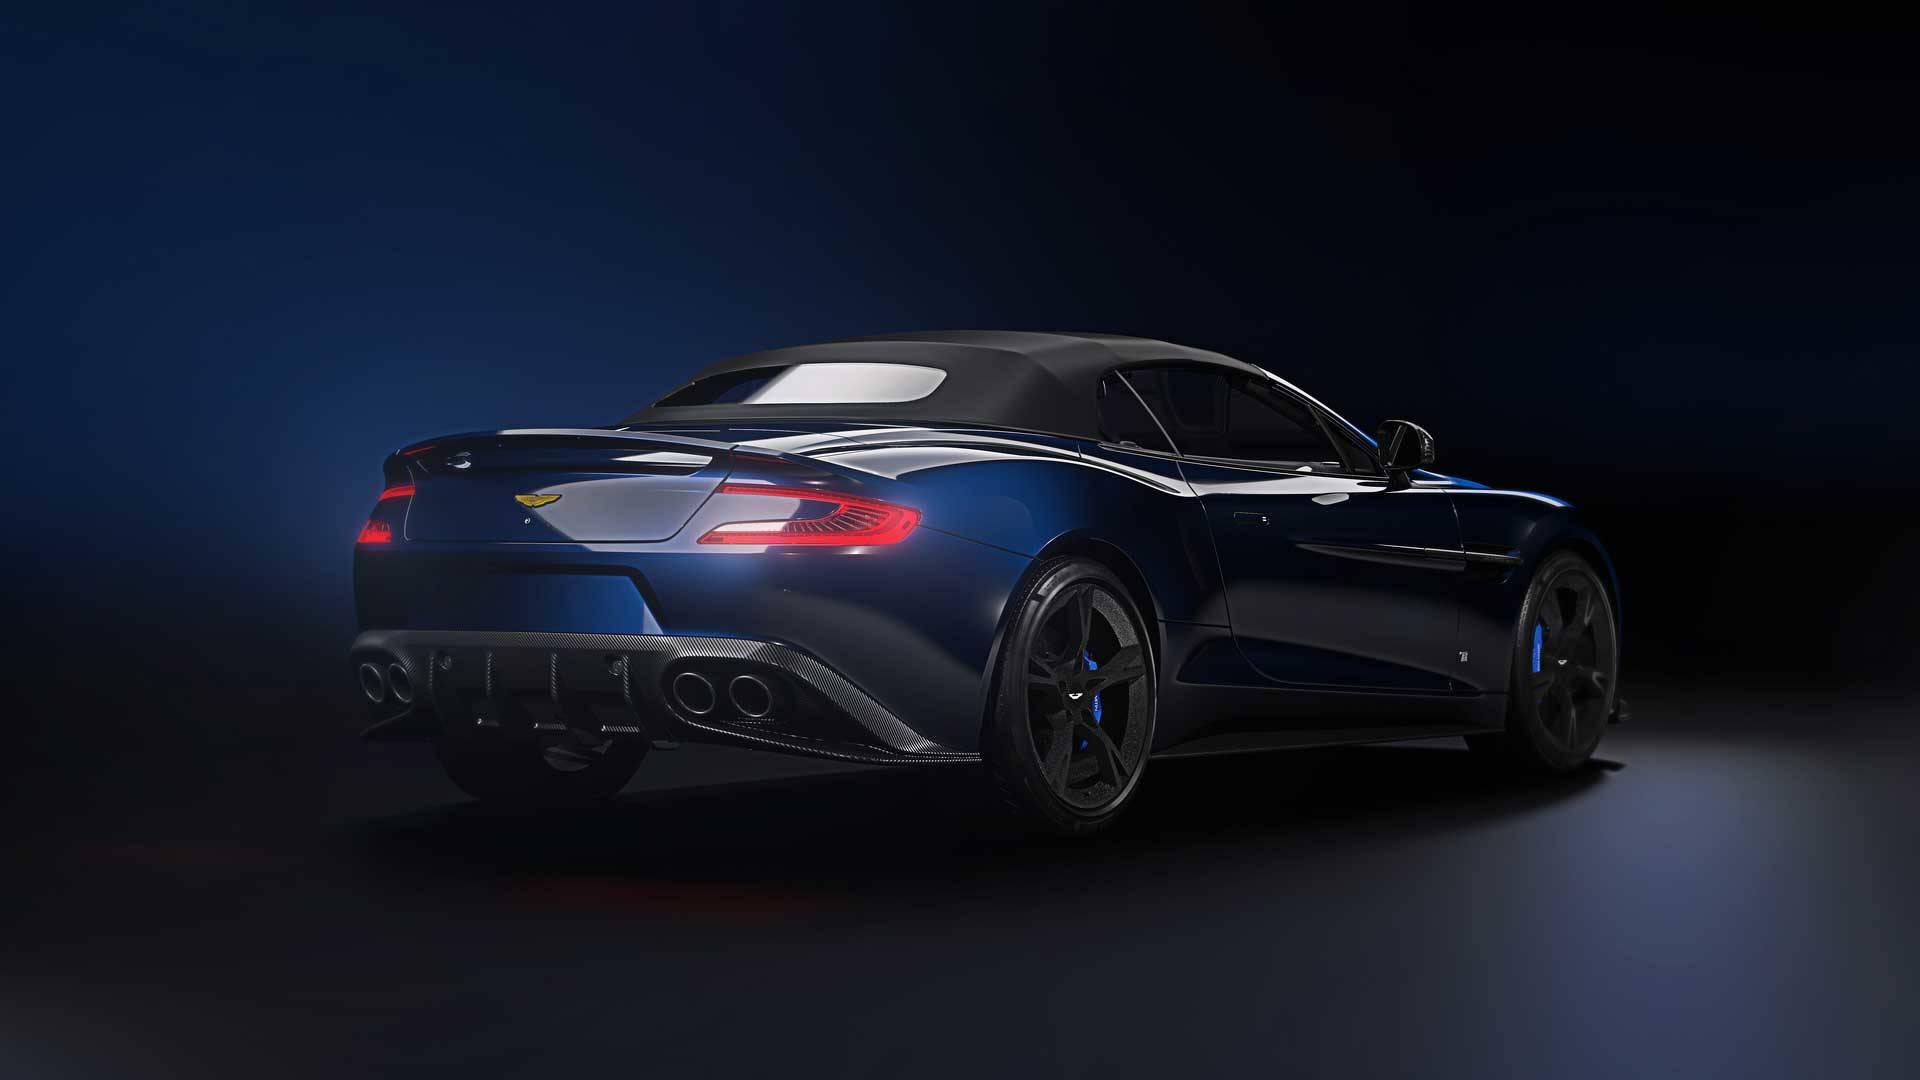 Tom Brady Gets His Name On LimitedEdition Aston Martin - 2018 aston martin vanquish convertible